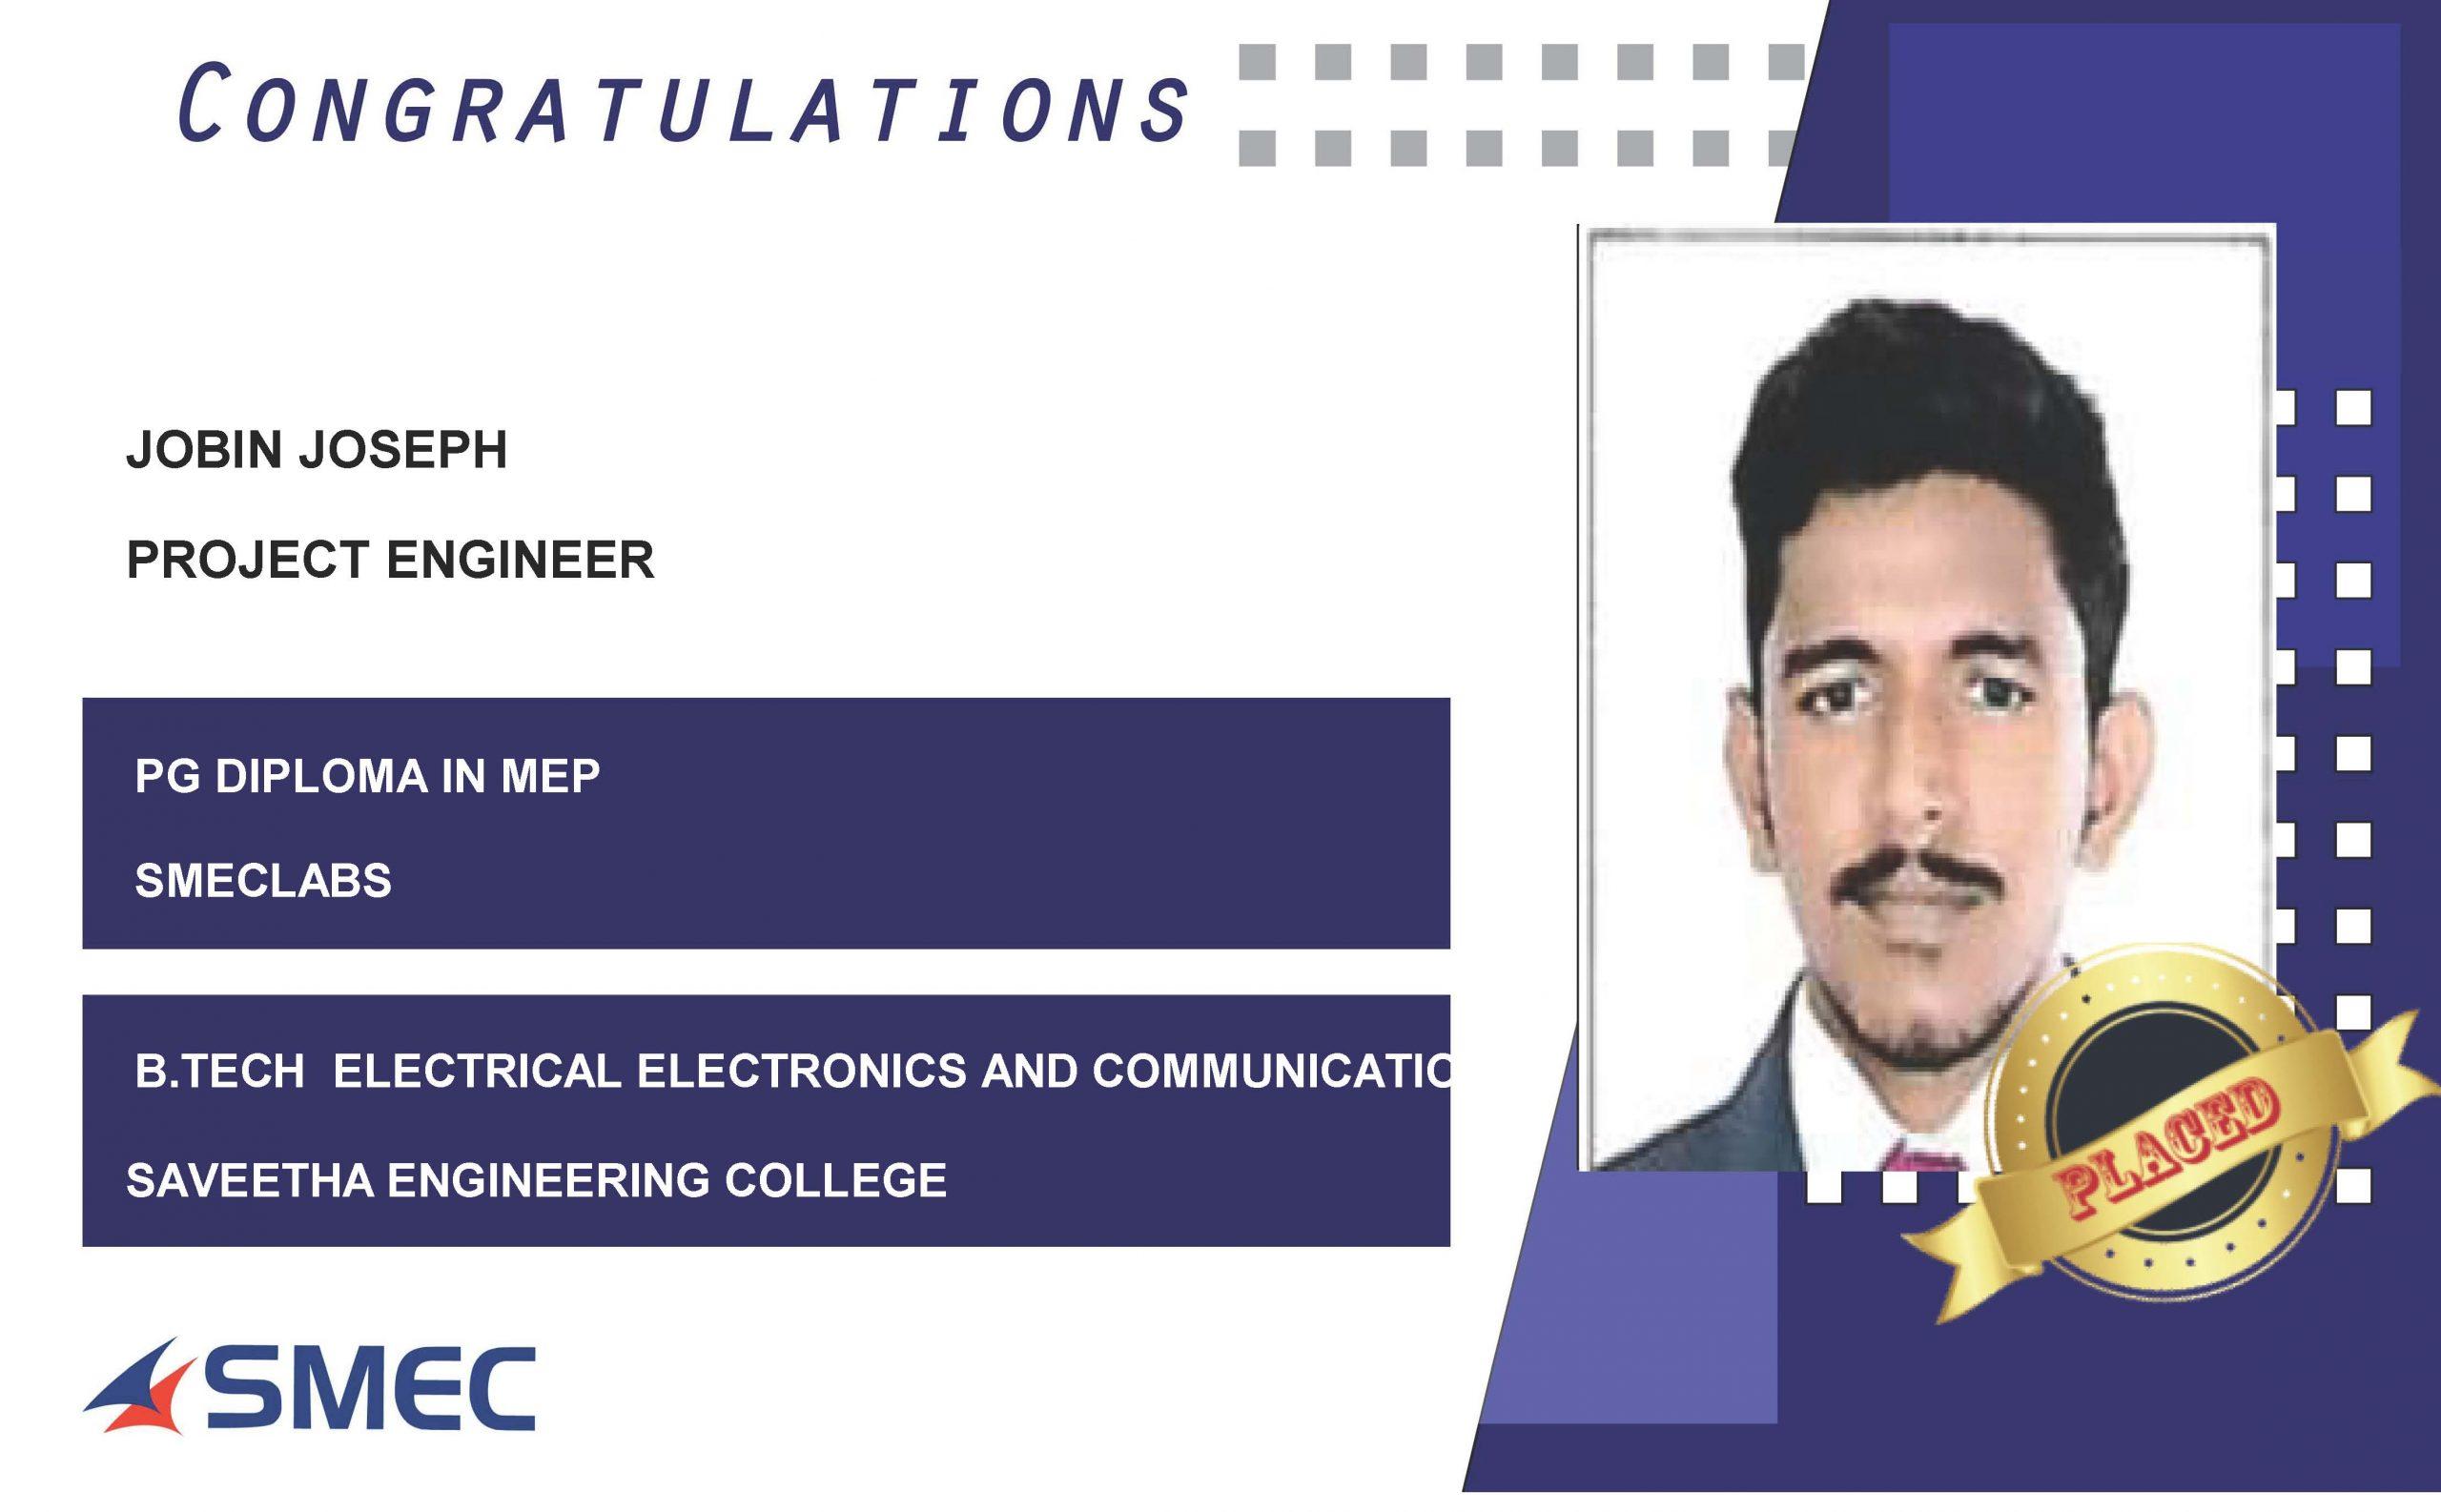 PROJECT ENGINEER-JOBIN JOSEPH